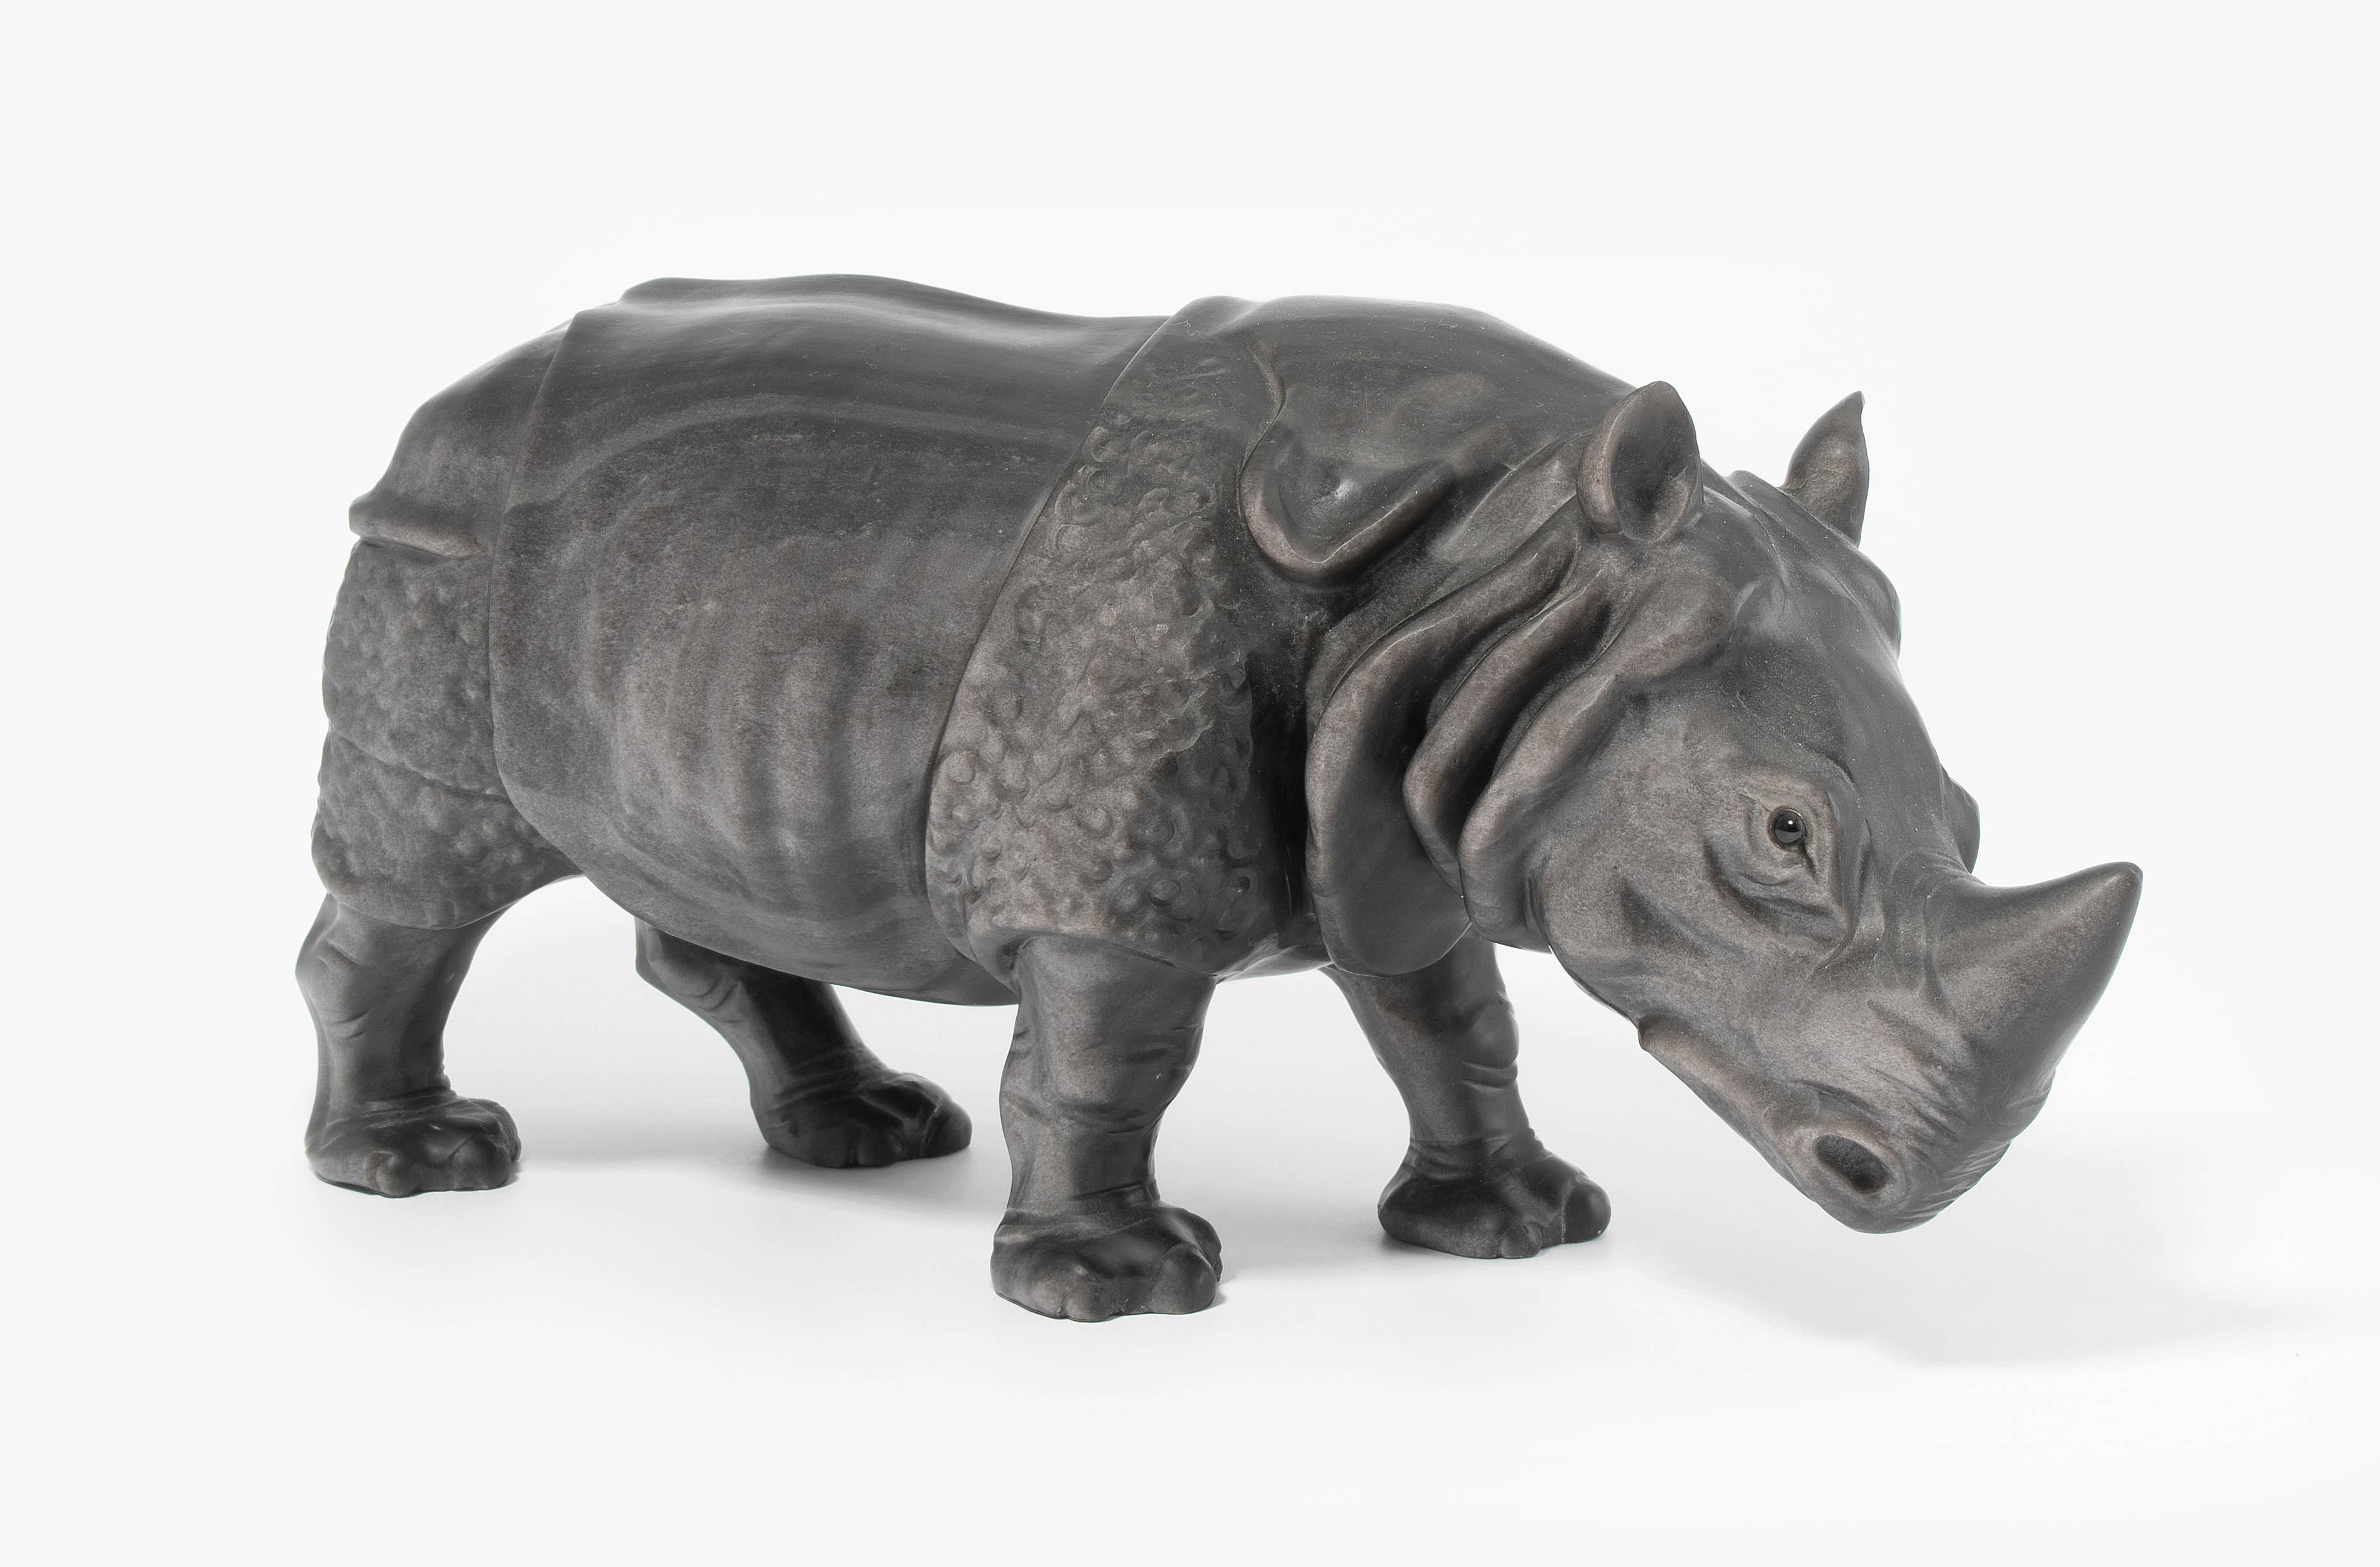 Tierfigur: Nashorn